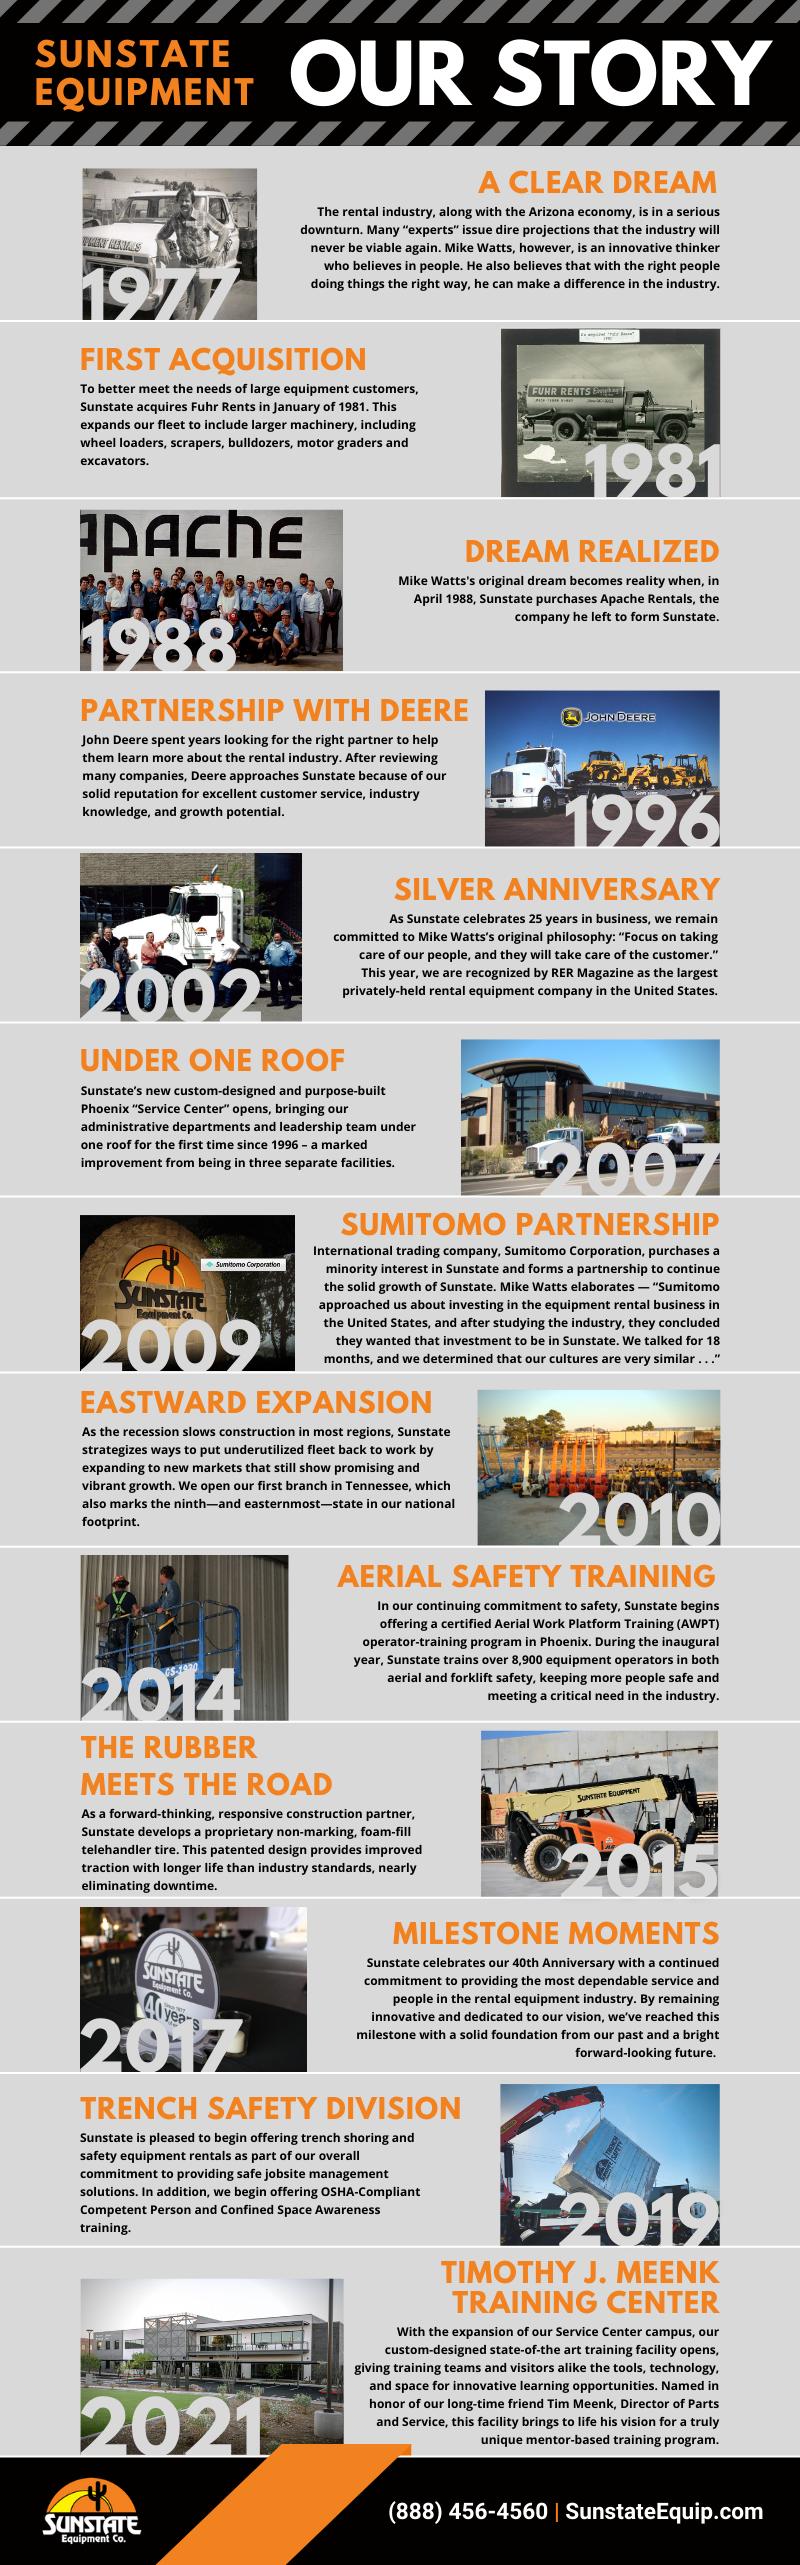 Sunstate timeline infographic